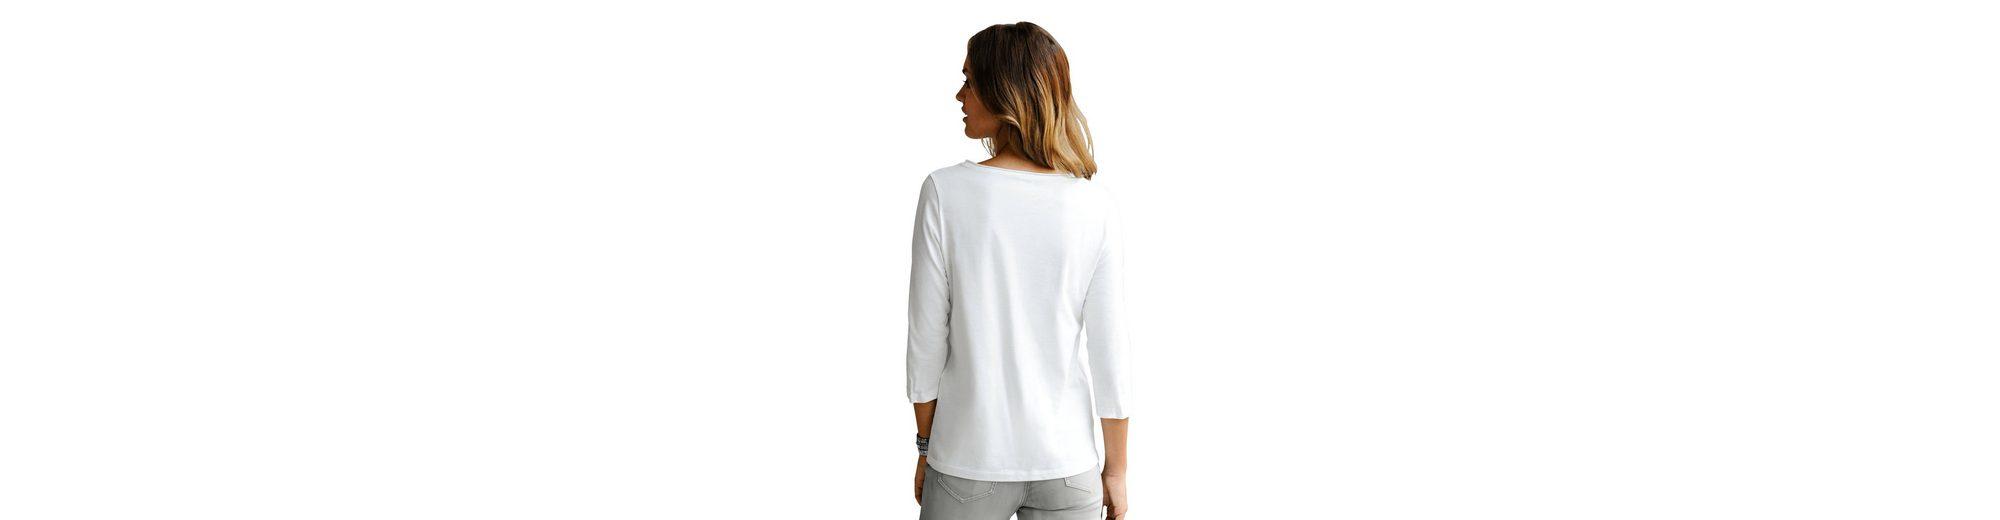 Alba Moda Shirt mit Sternedruck Billige Sneakernews PyTqfBFd